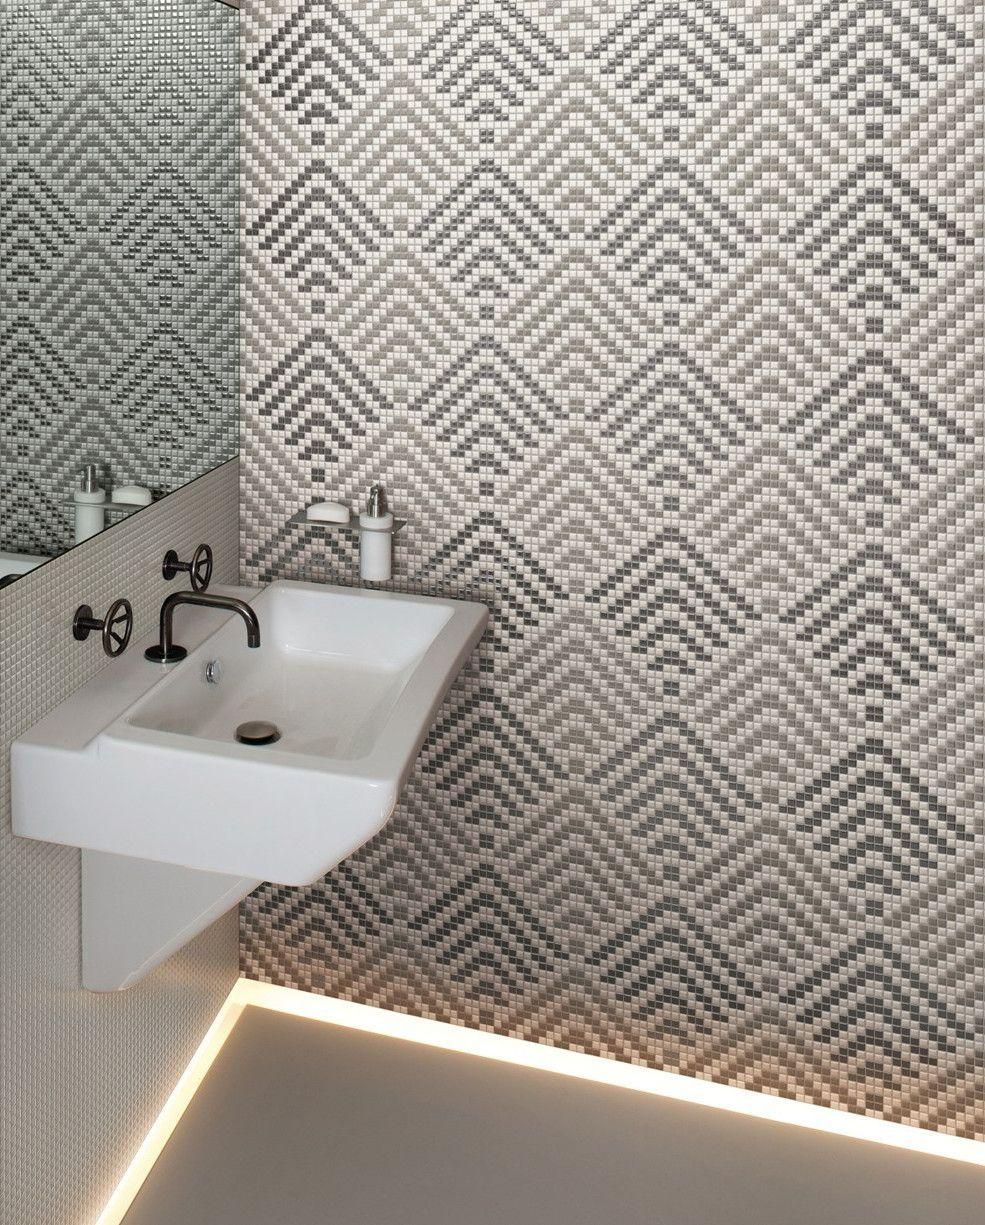 mosaici optical in versione opaca o lucida allure la nuova collezione appiani al cersaie. Black Bedroom Furniture Sets. Home Design Ideas